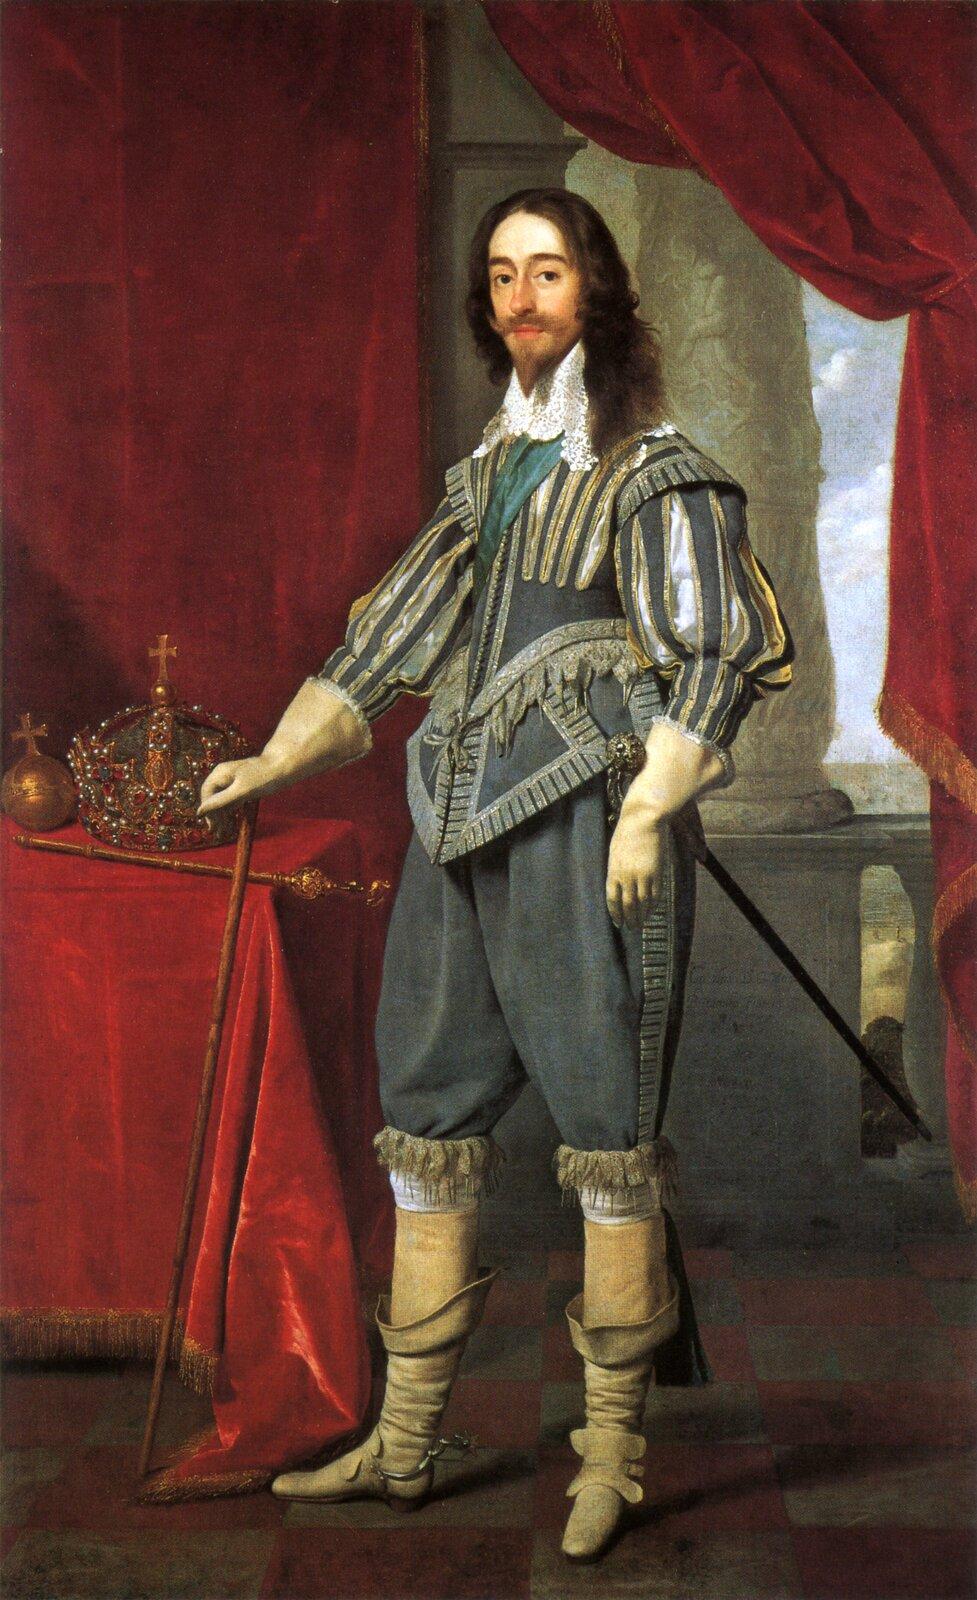 PortretKarola IStuarta. PortretKarola IStuarta. Źródło: Daniël Mijtens, 1631, National Portrait Gallery, domena publiczna.